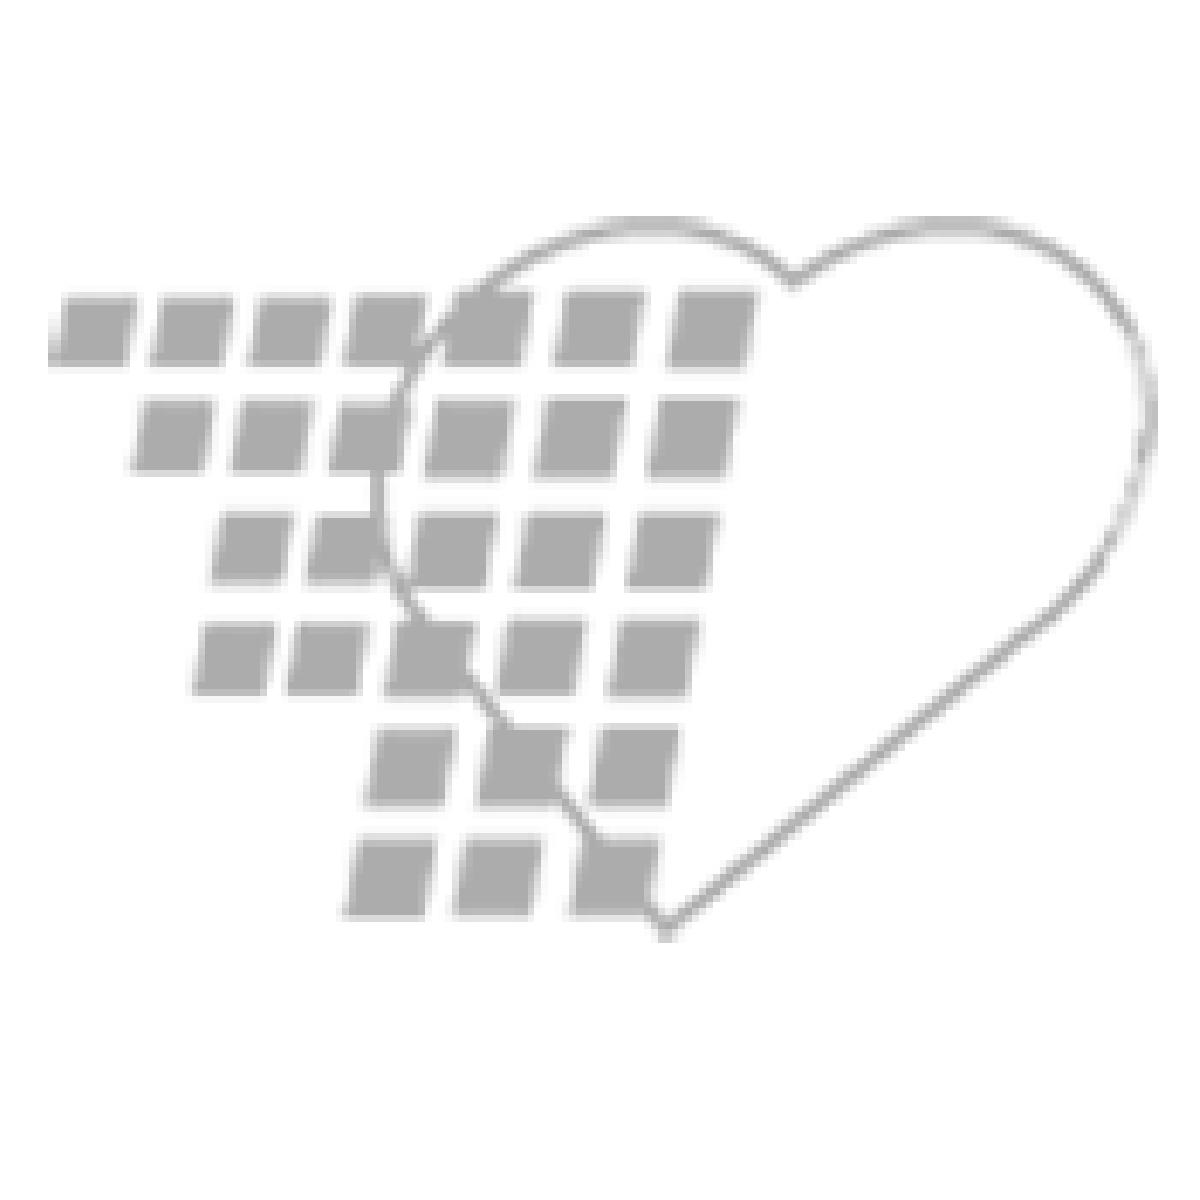 02-44-1010 - Zoll AED Plus Defibrillator